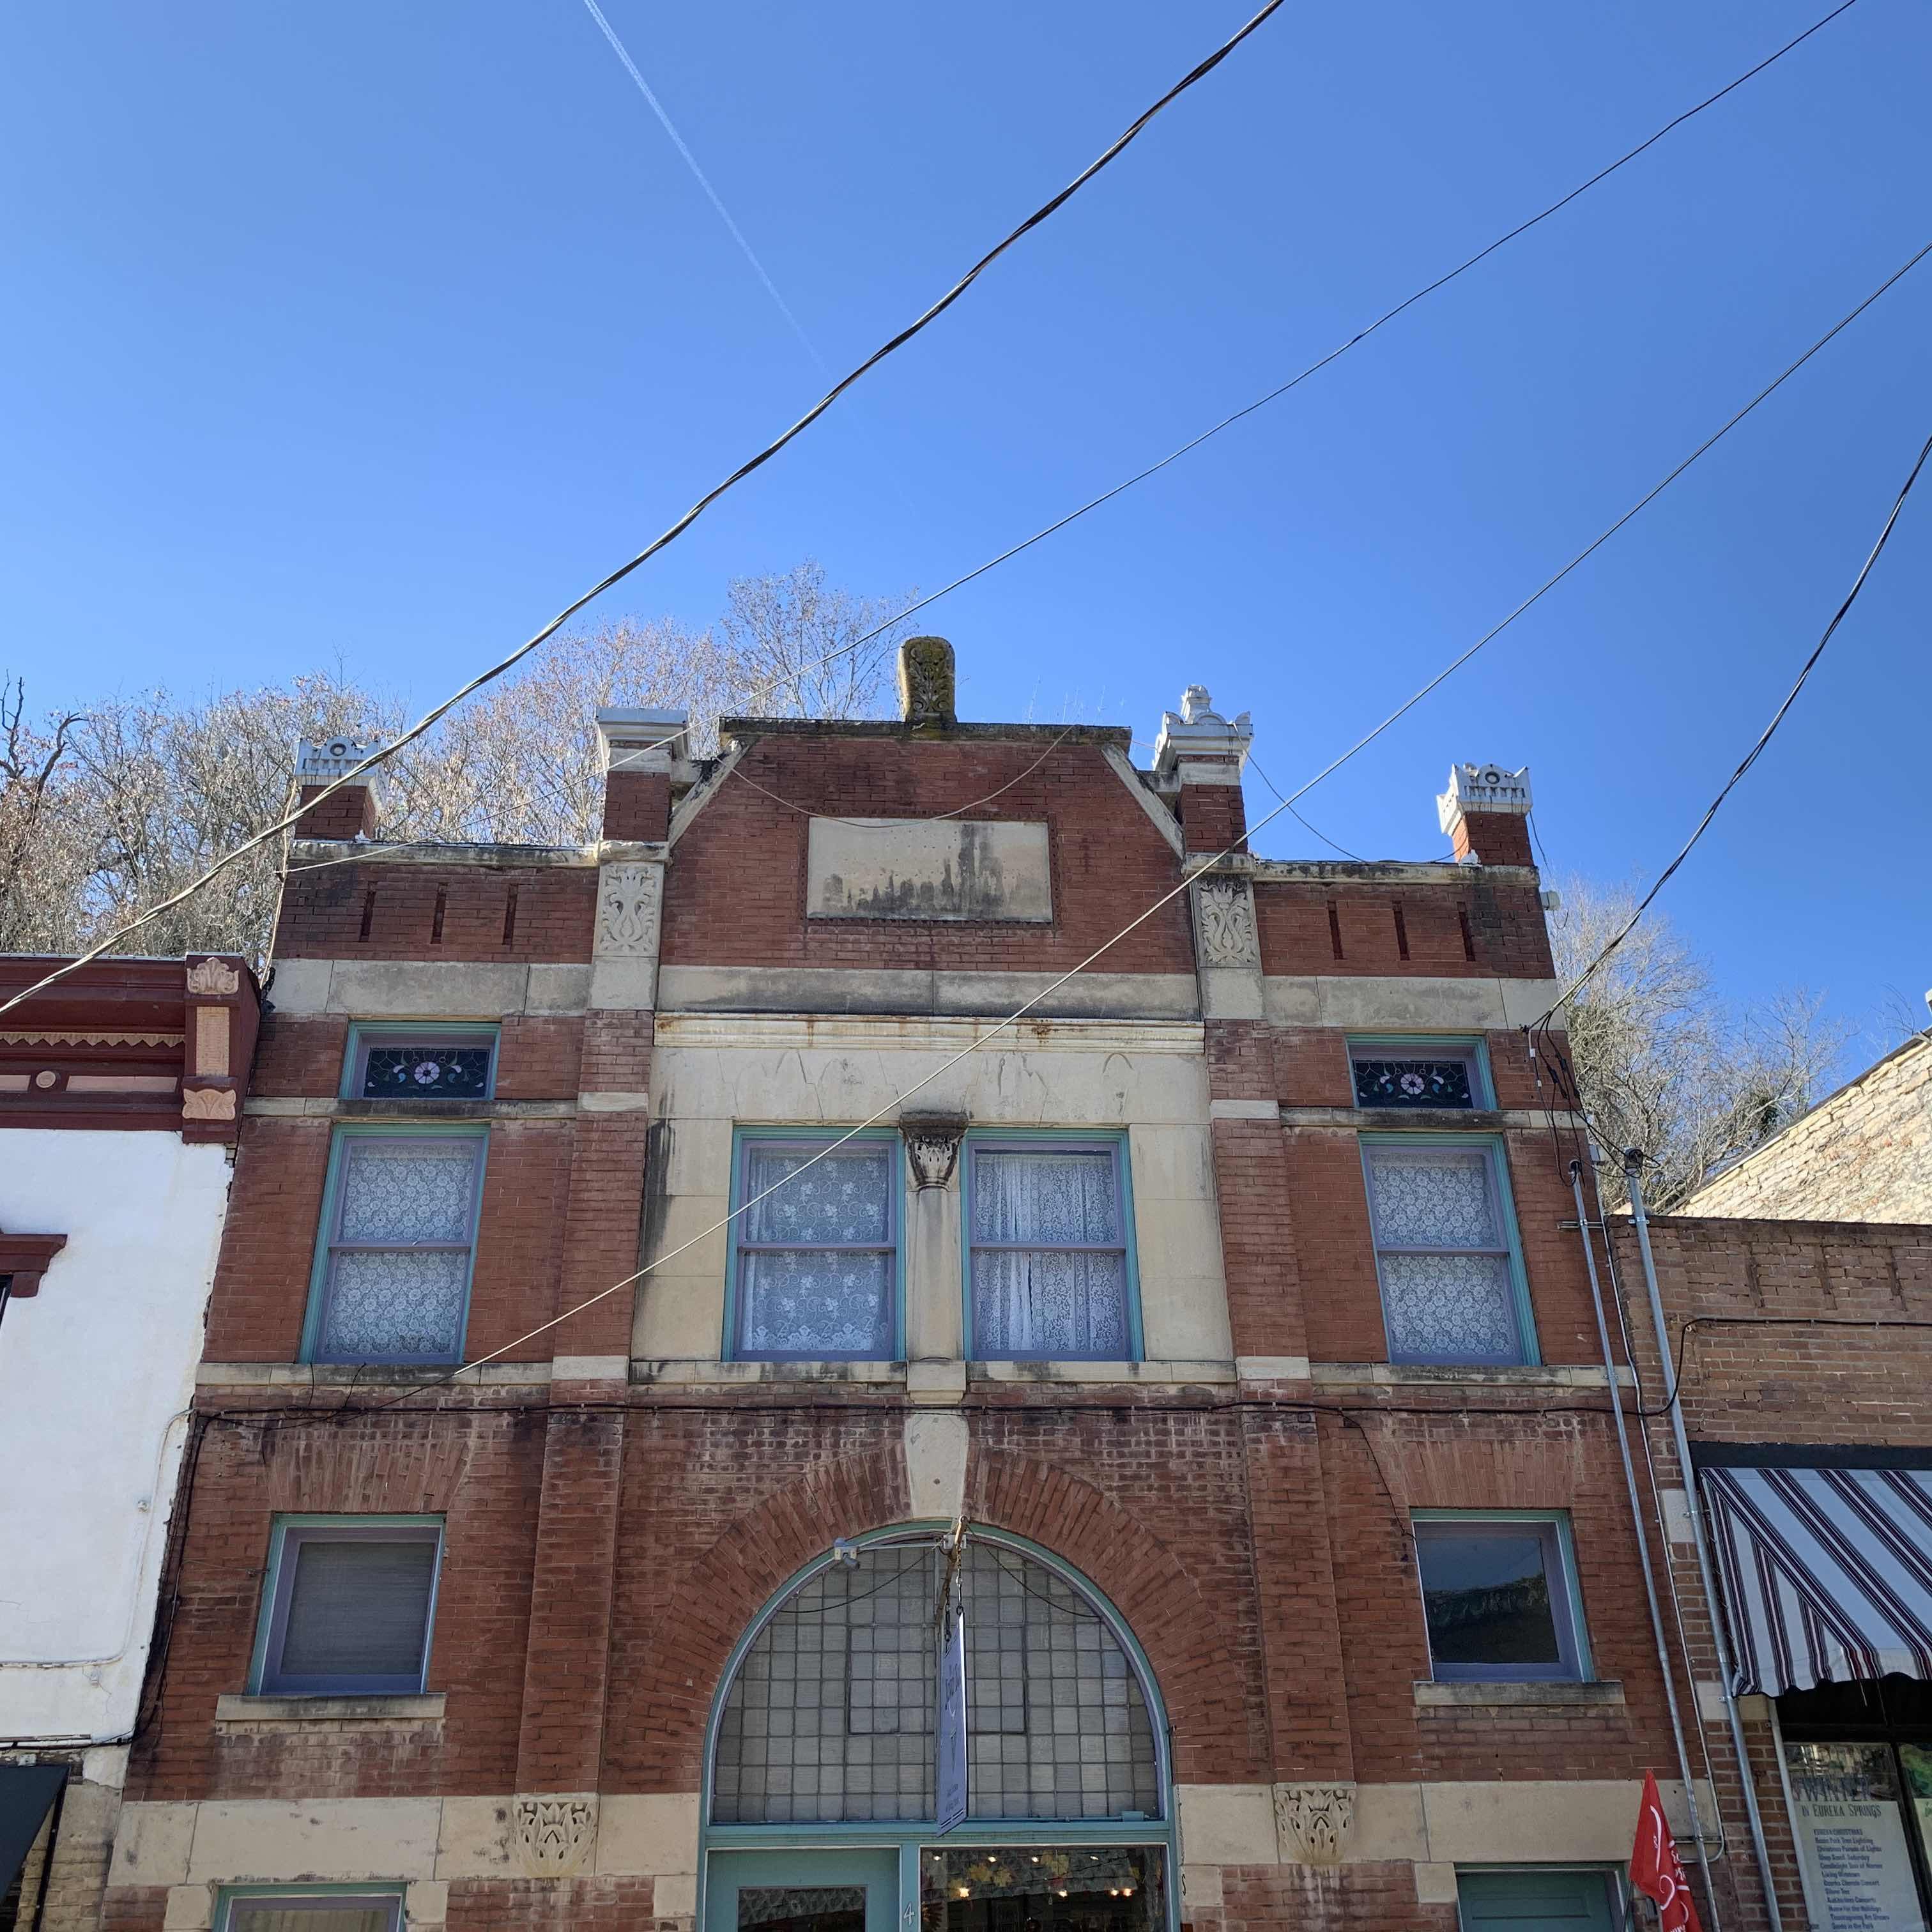 The Original Bank in Eureka Springs on Spring Street